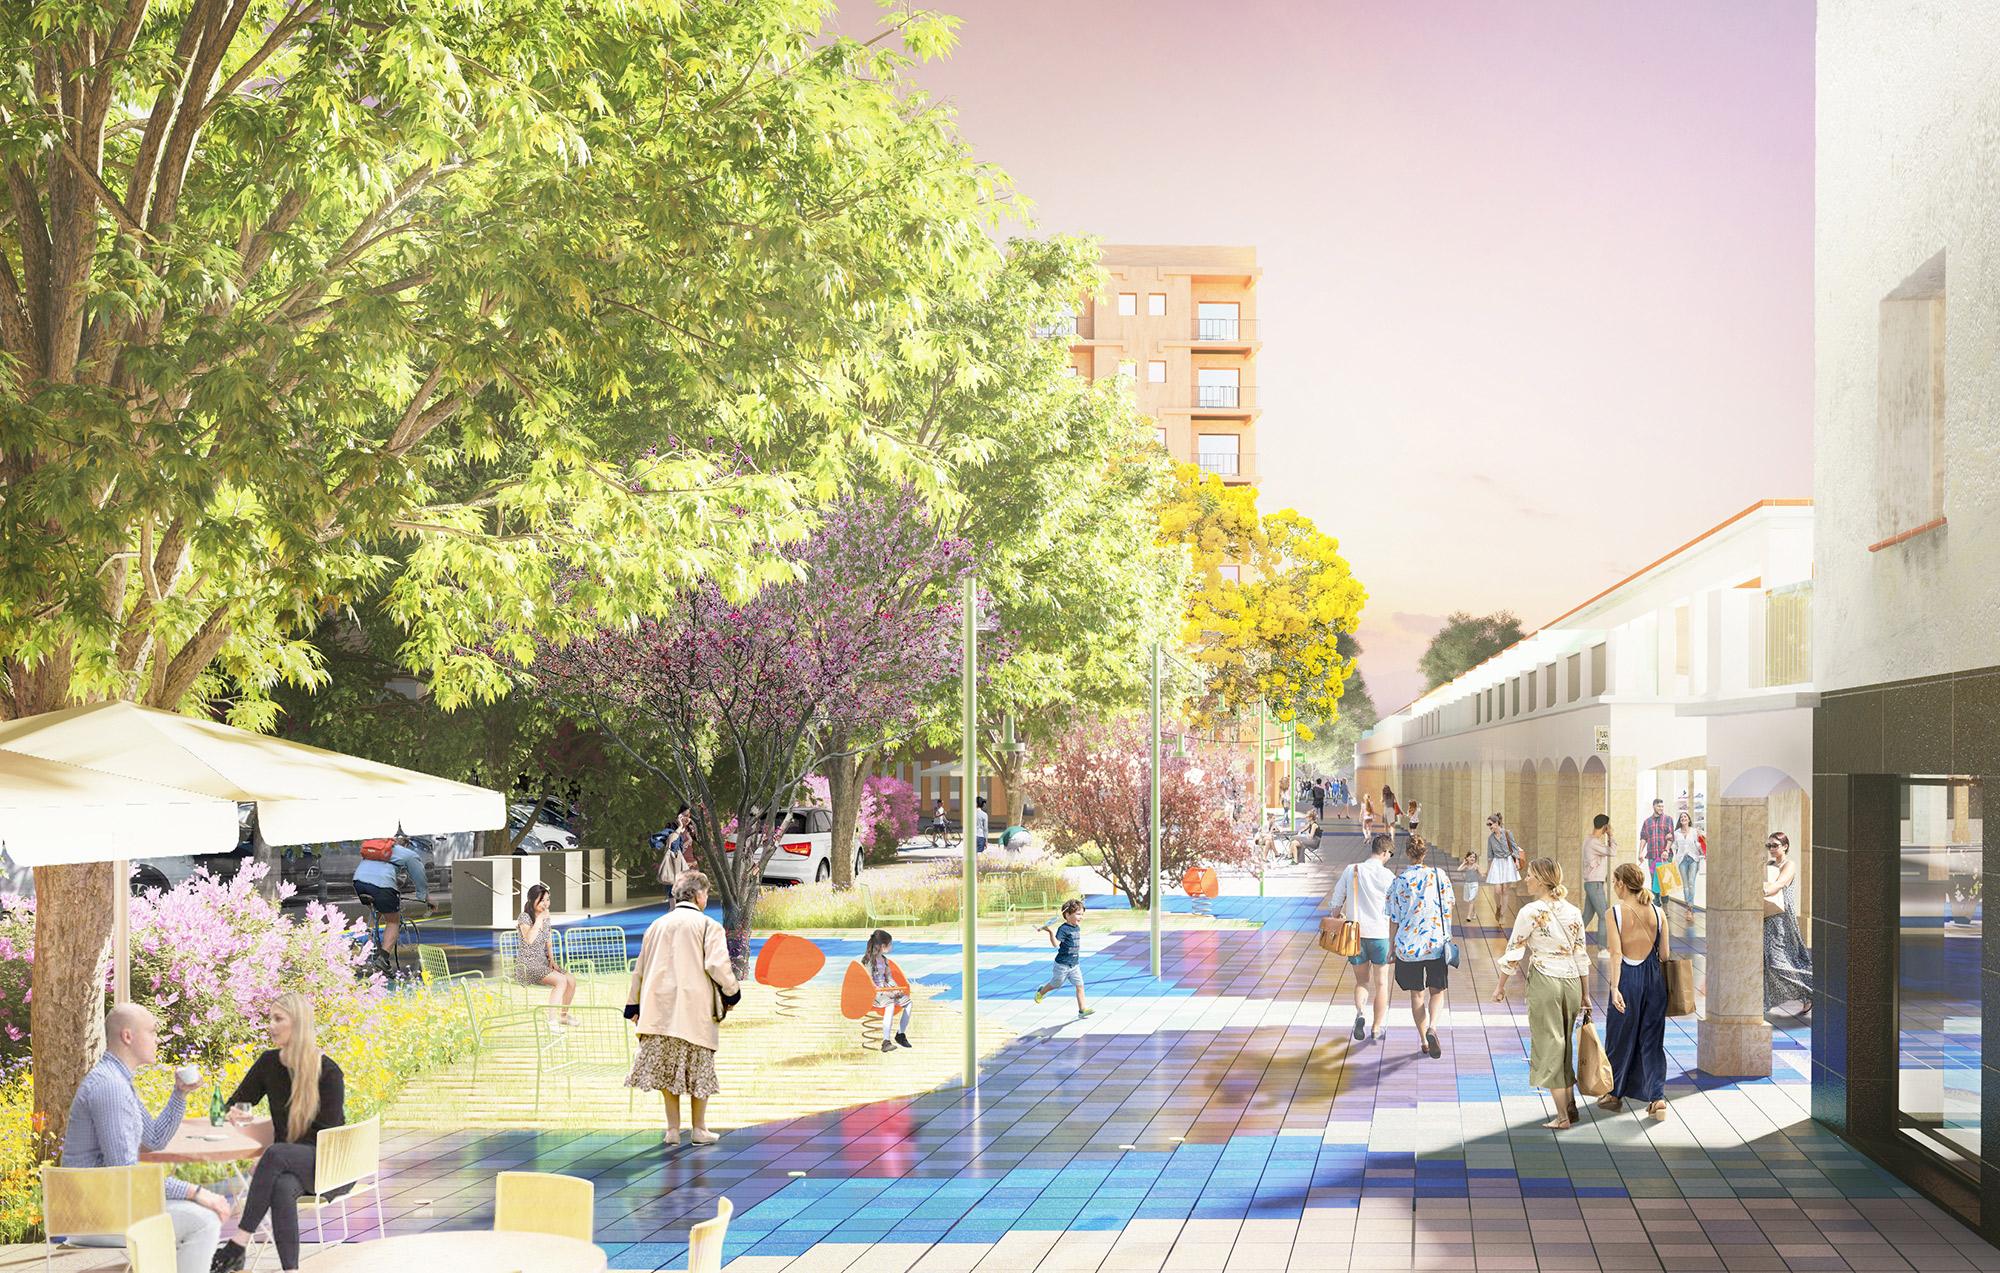 concurs nova avinguda centre platja d'aro